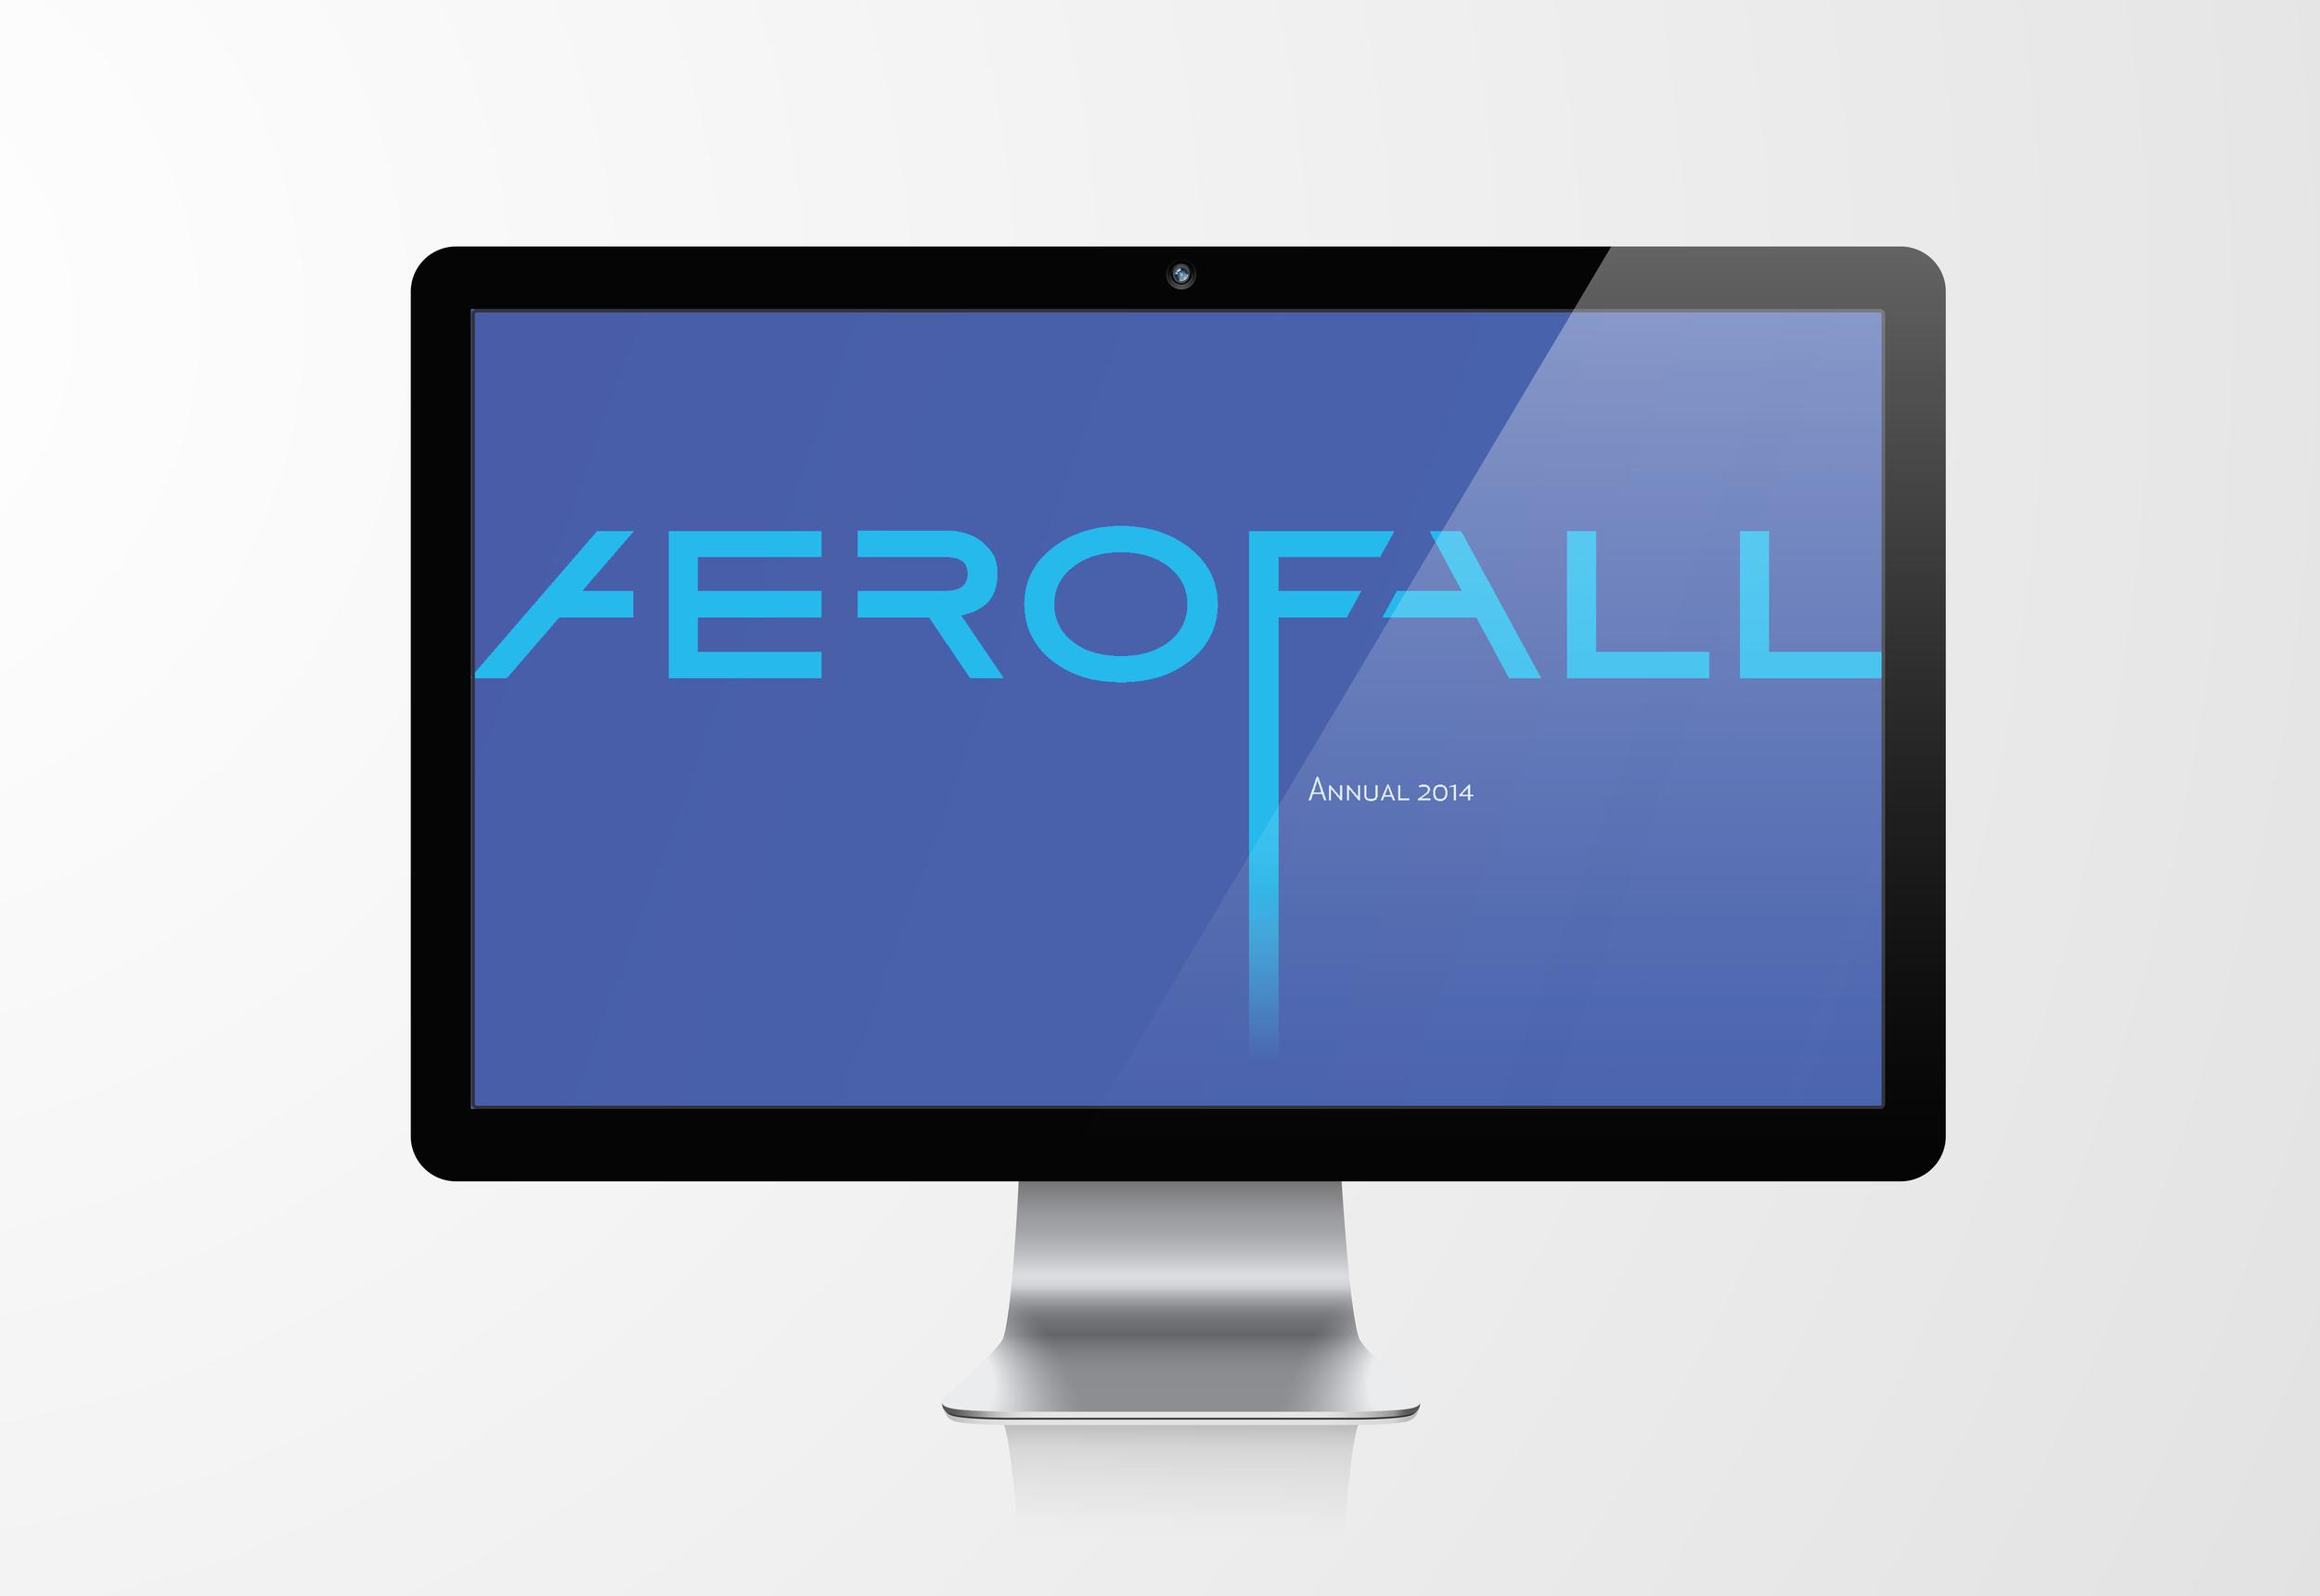 Aerofall_Infograph mock title.jpg